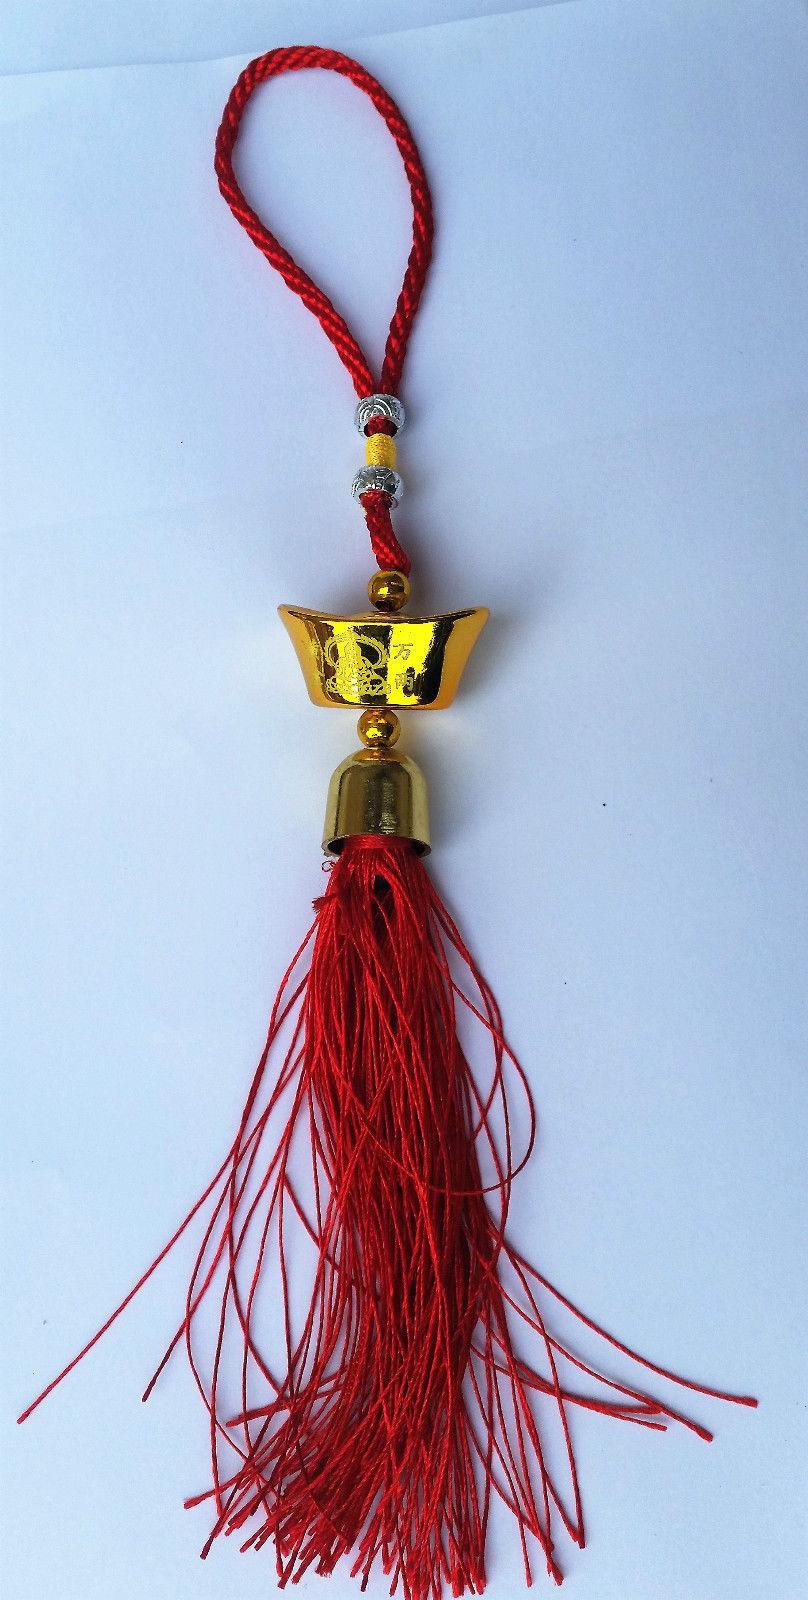 Talisman Priction Amuleto Chino Feng Shui Charm Tipo Anillo Puerta Colgante